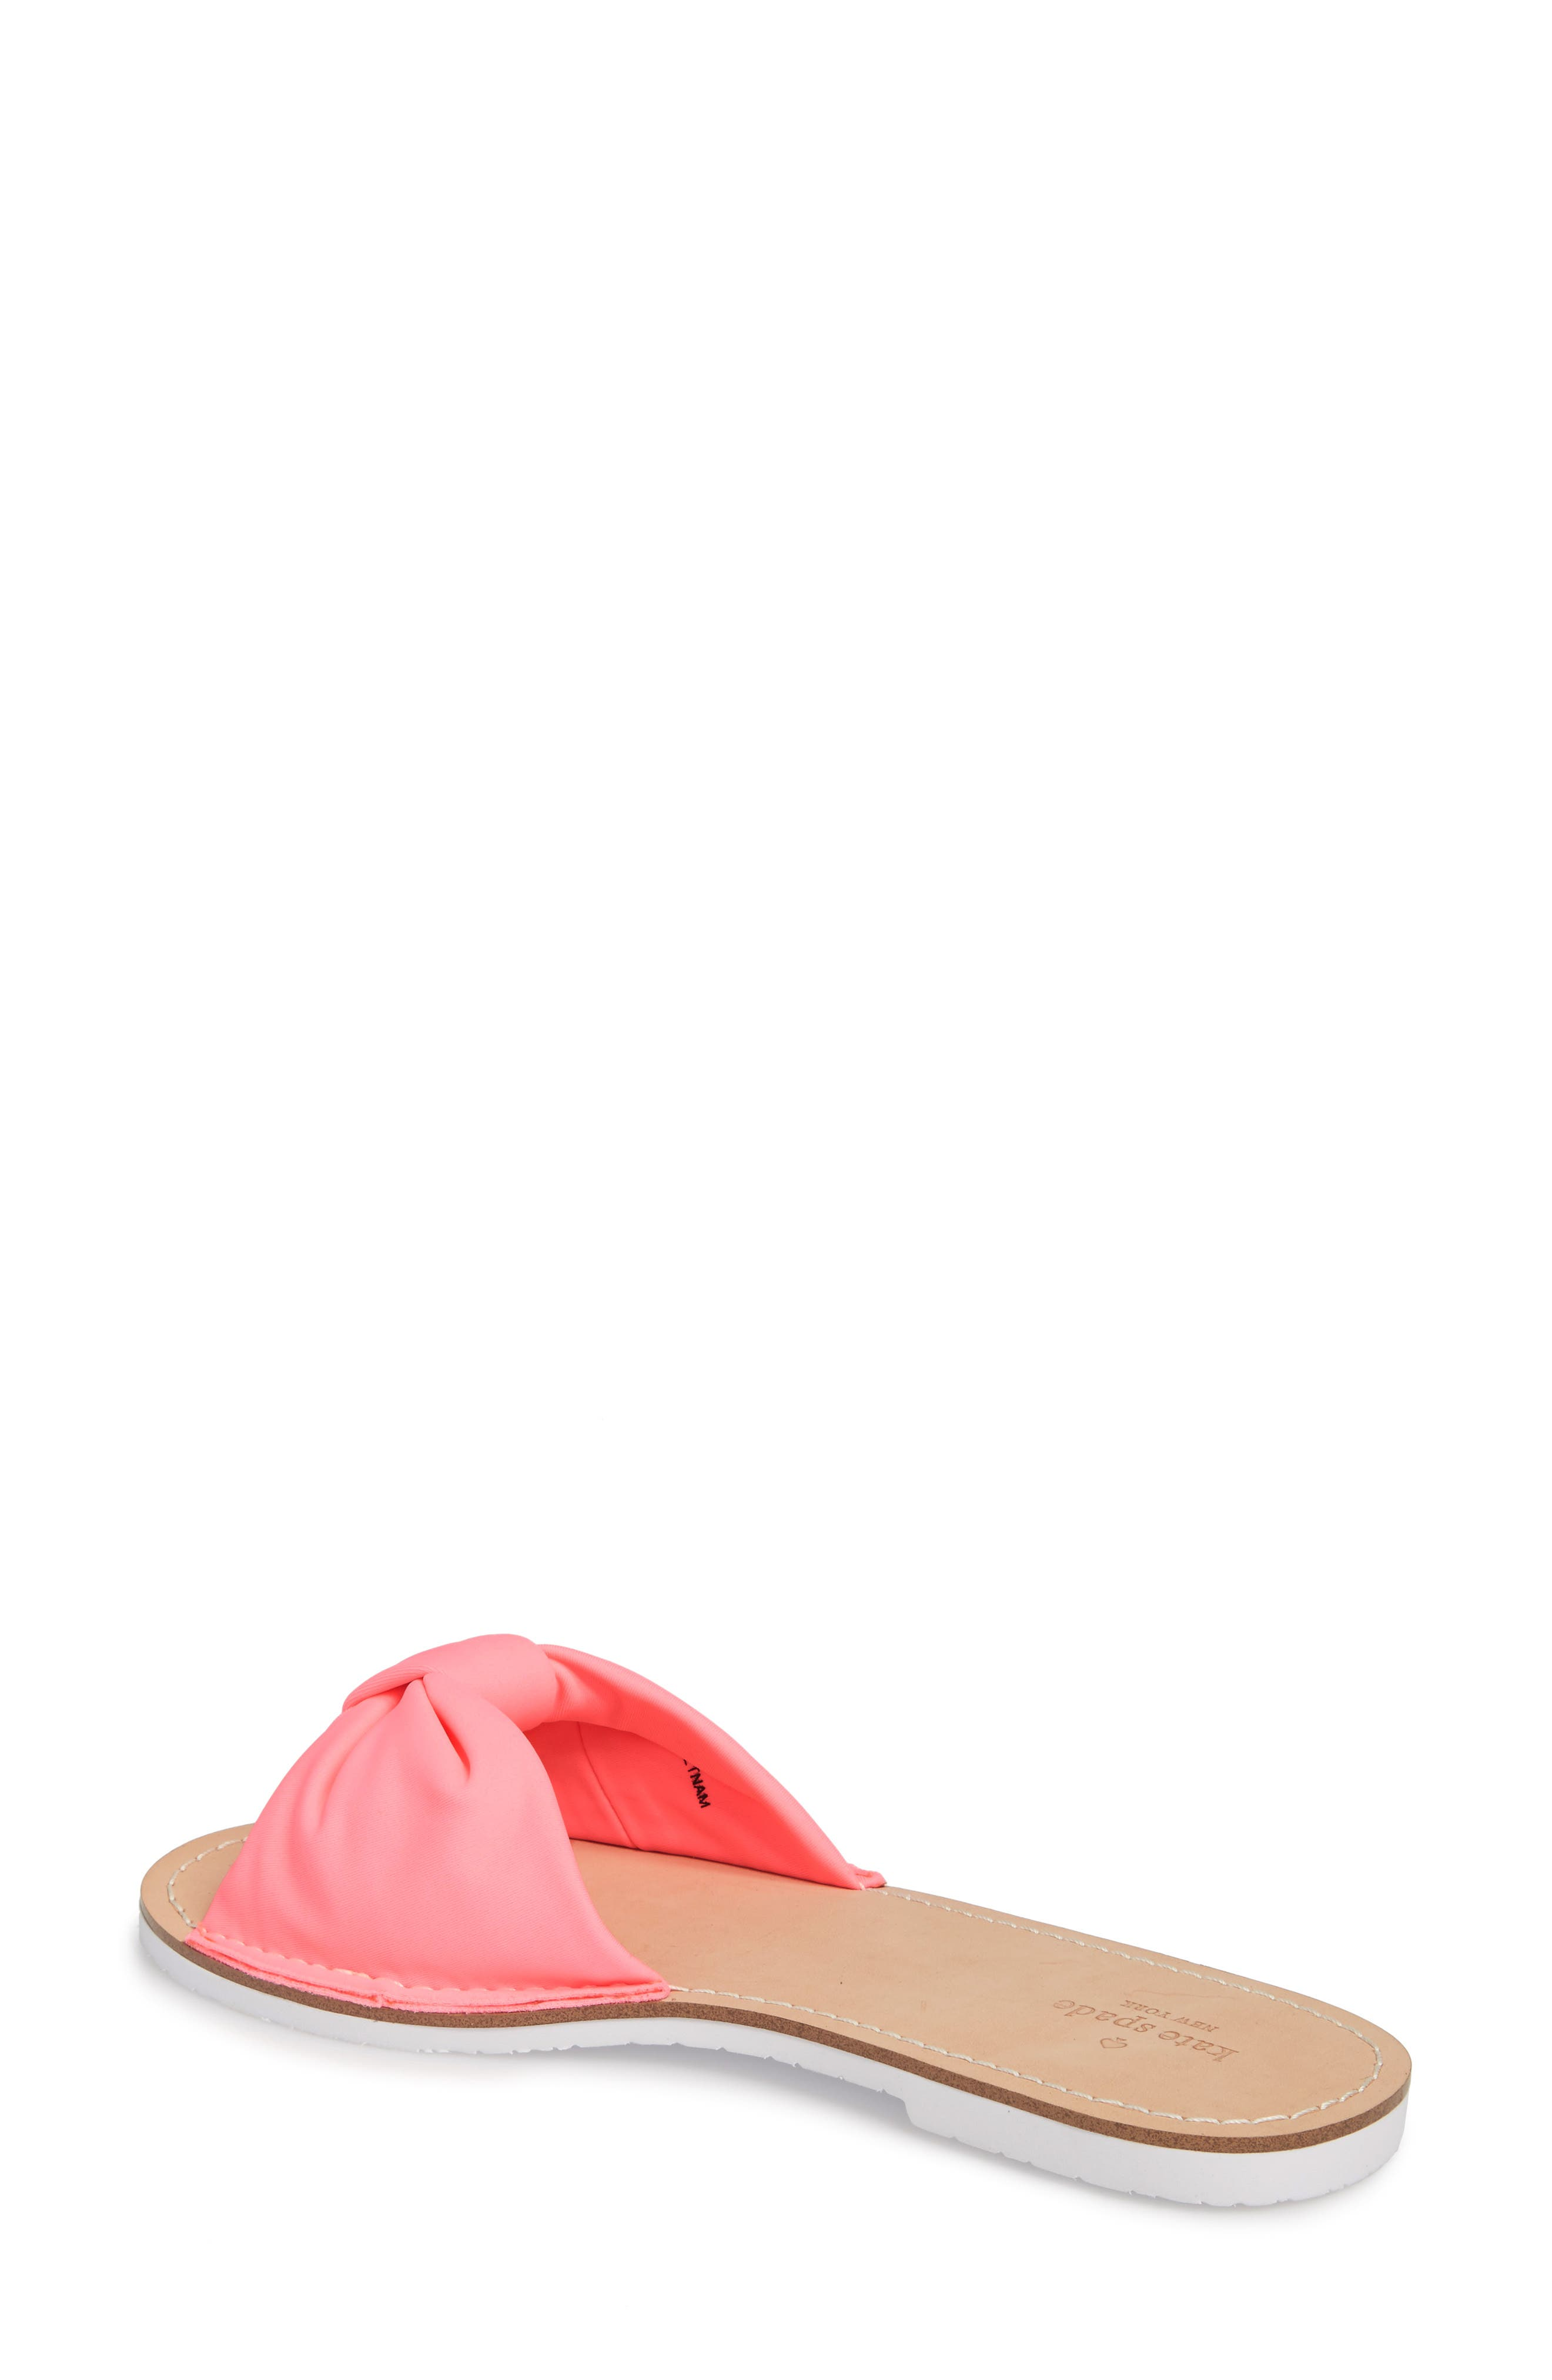 indi slide sandal,                             Alternate thumbnail 6, color,